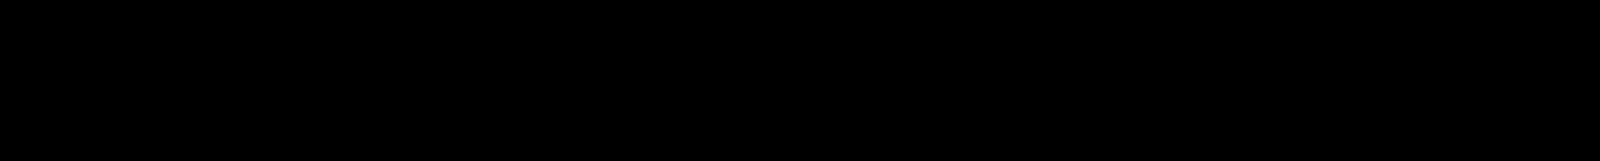 Формула горения топлива